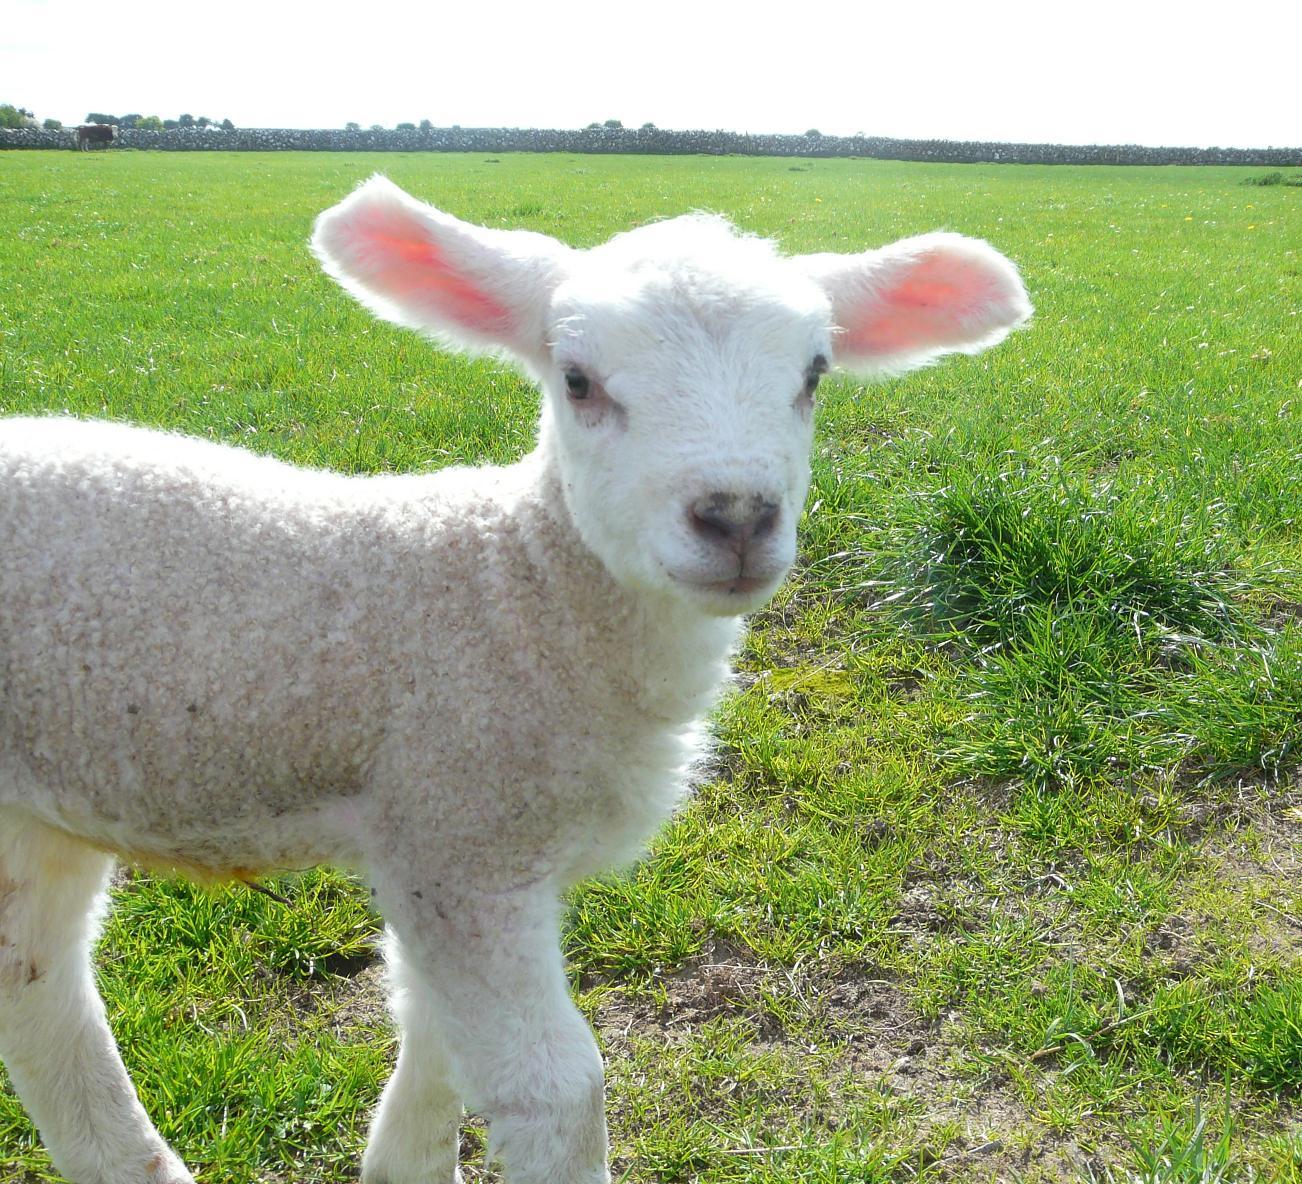 Bloat In Lambs